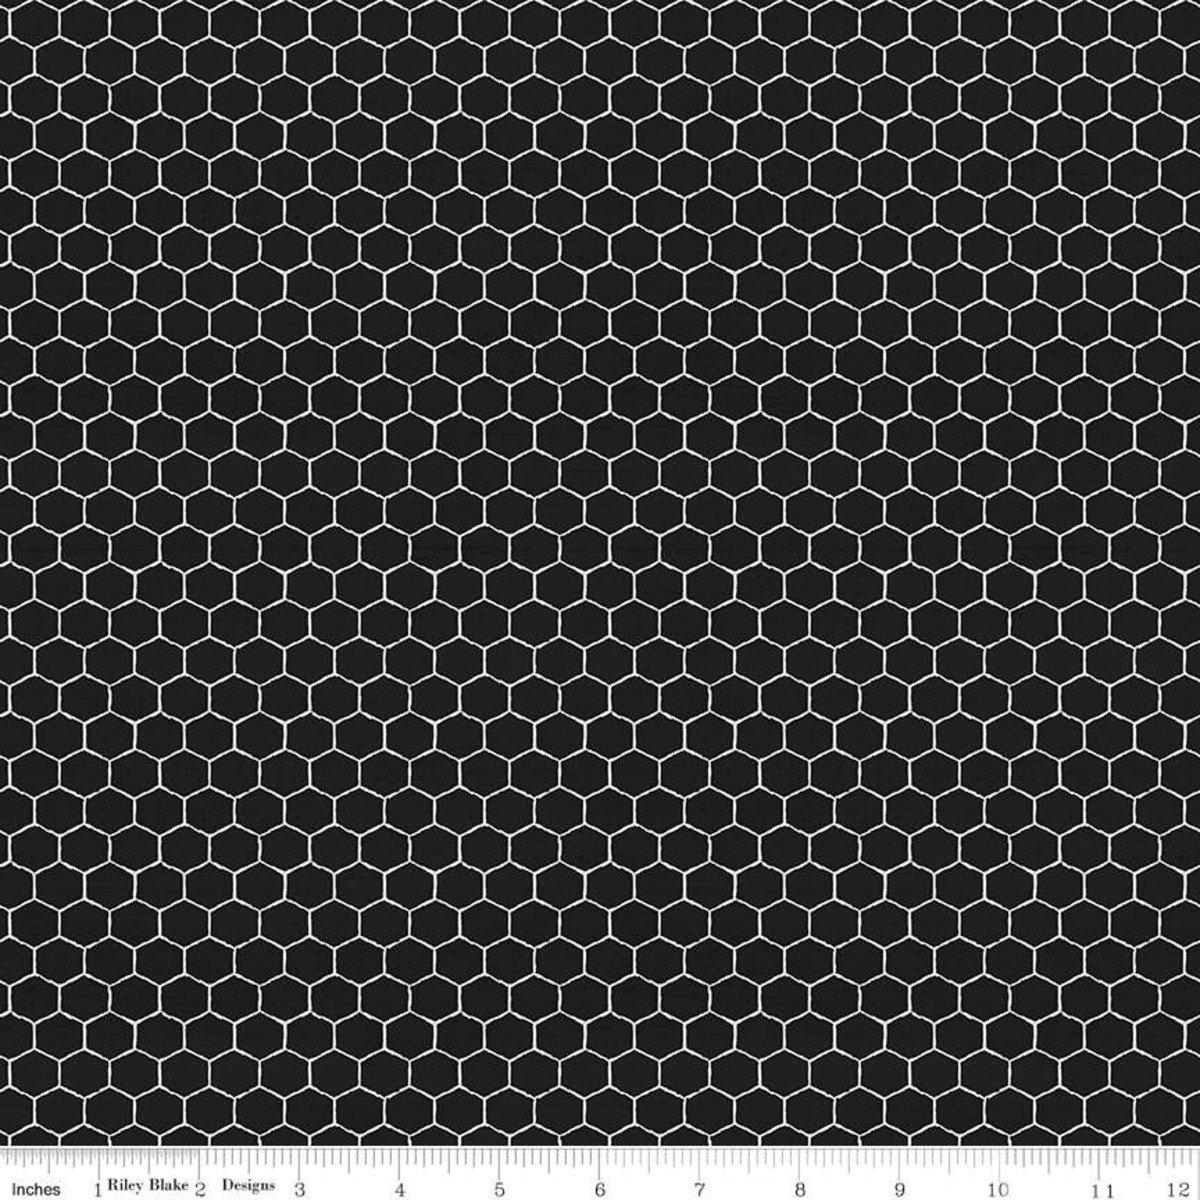 Bees Life C10104 Honeycomb Black